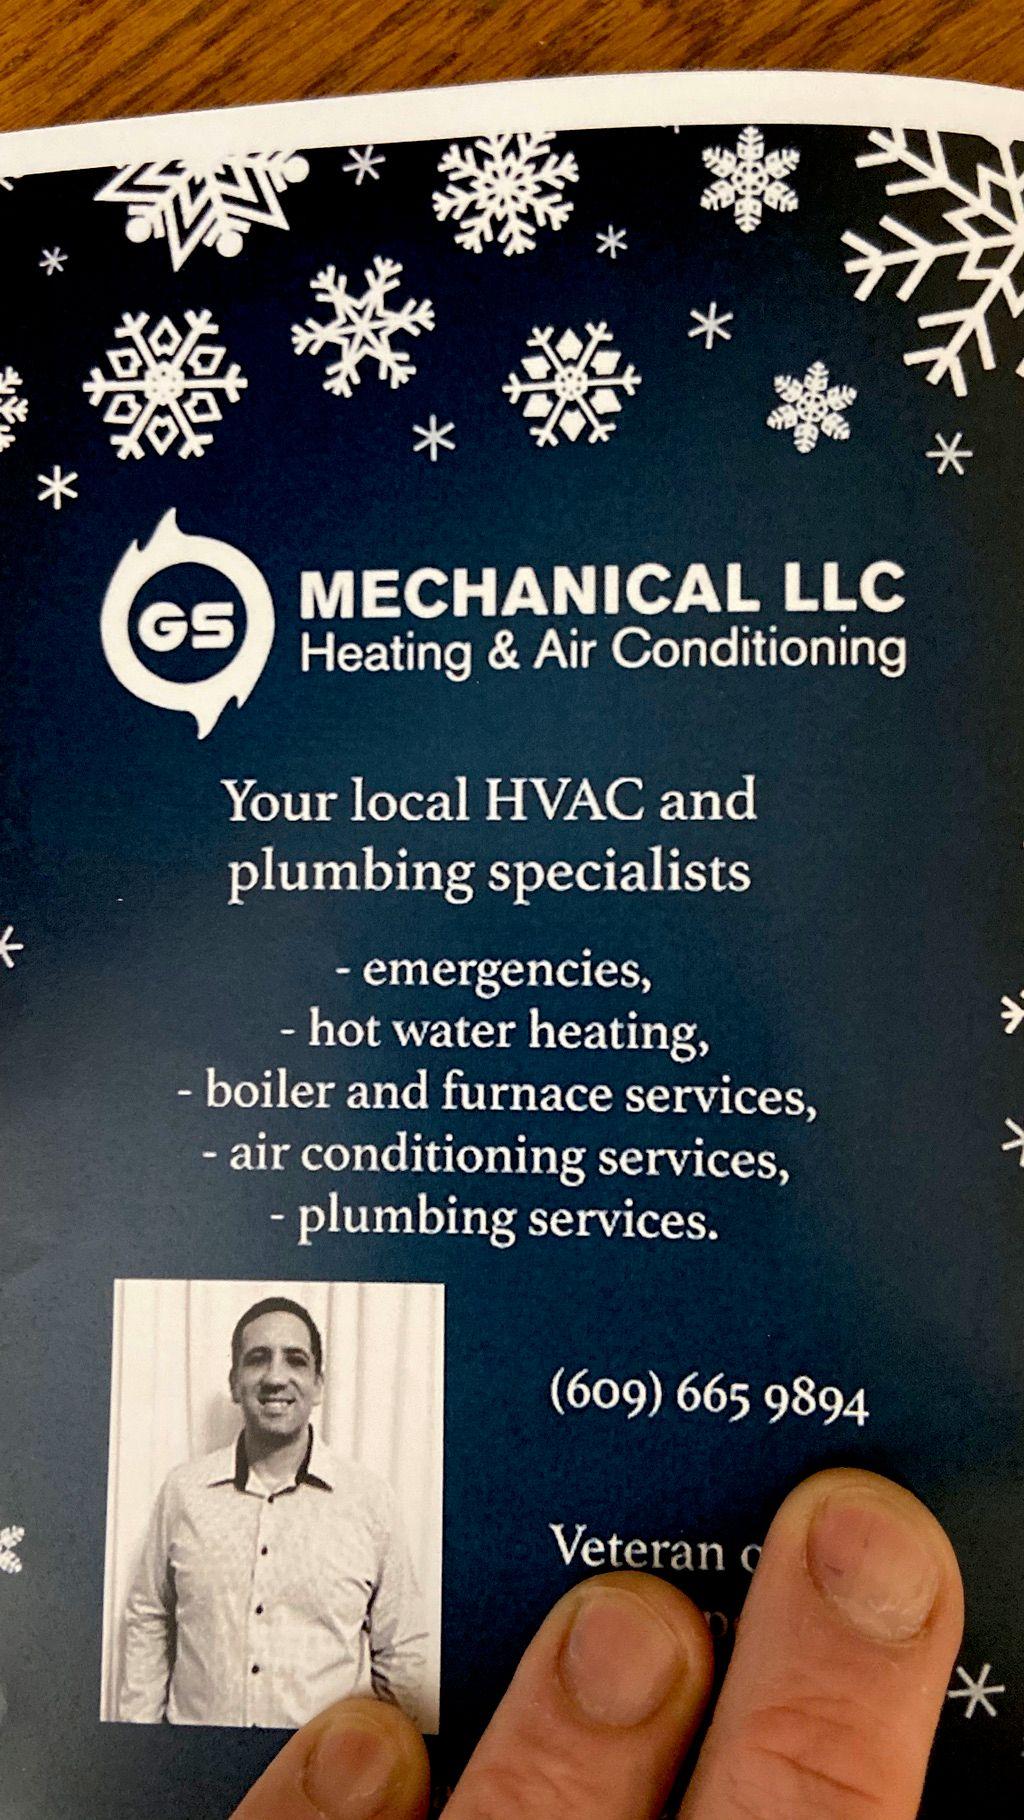 GS Mechanical LLC